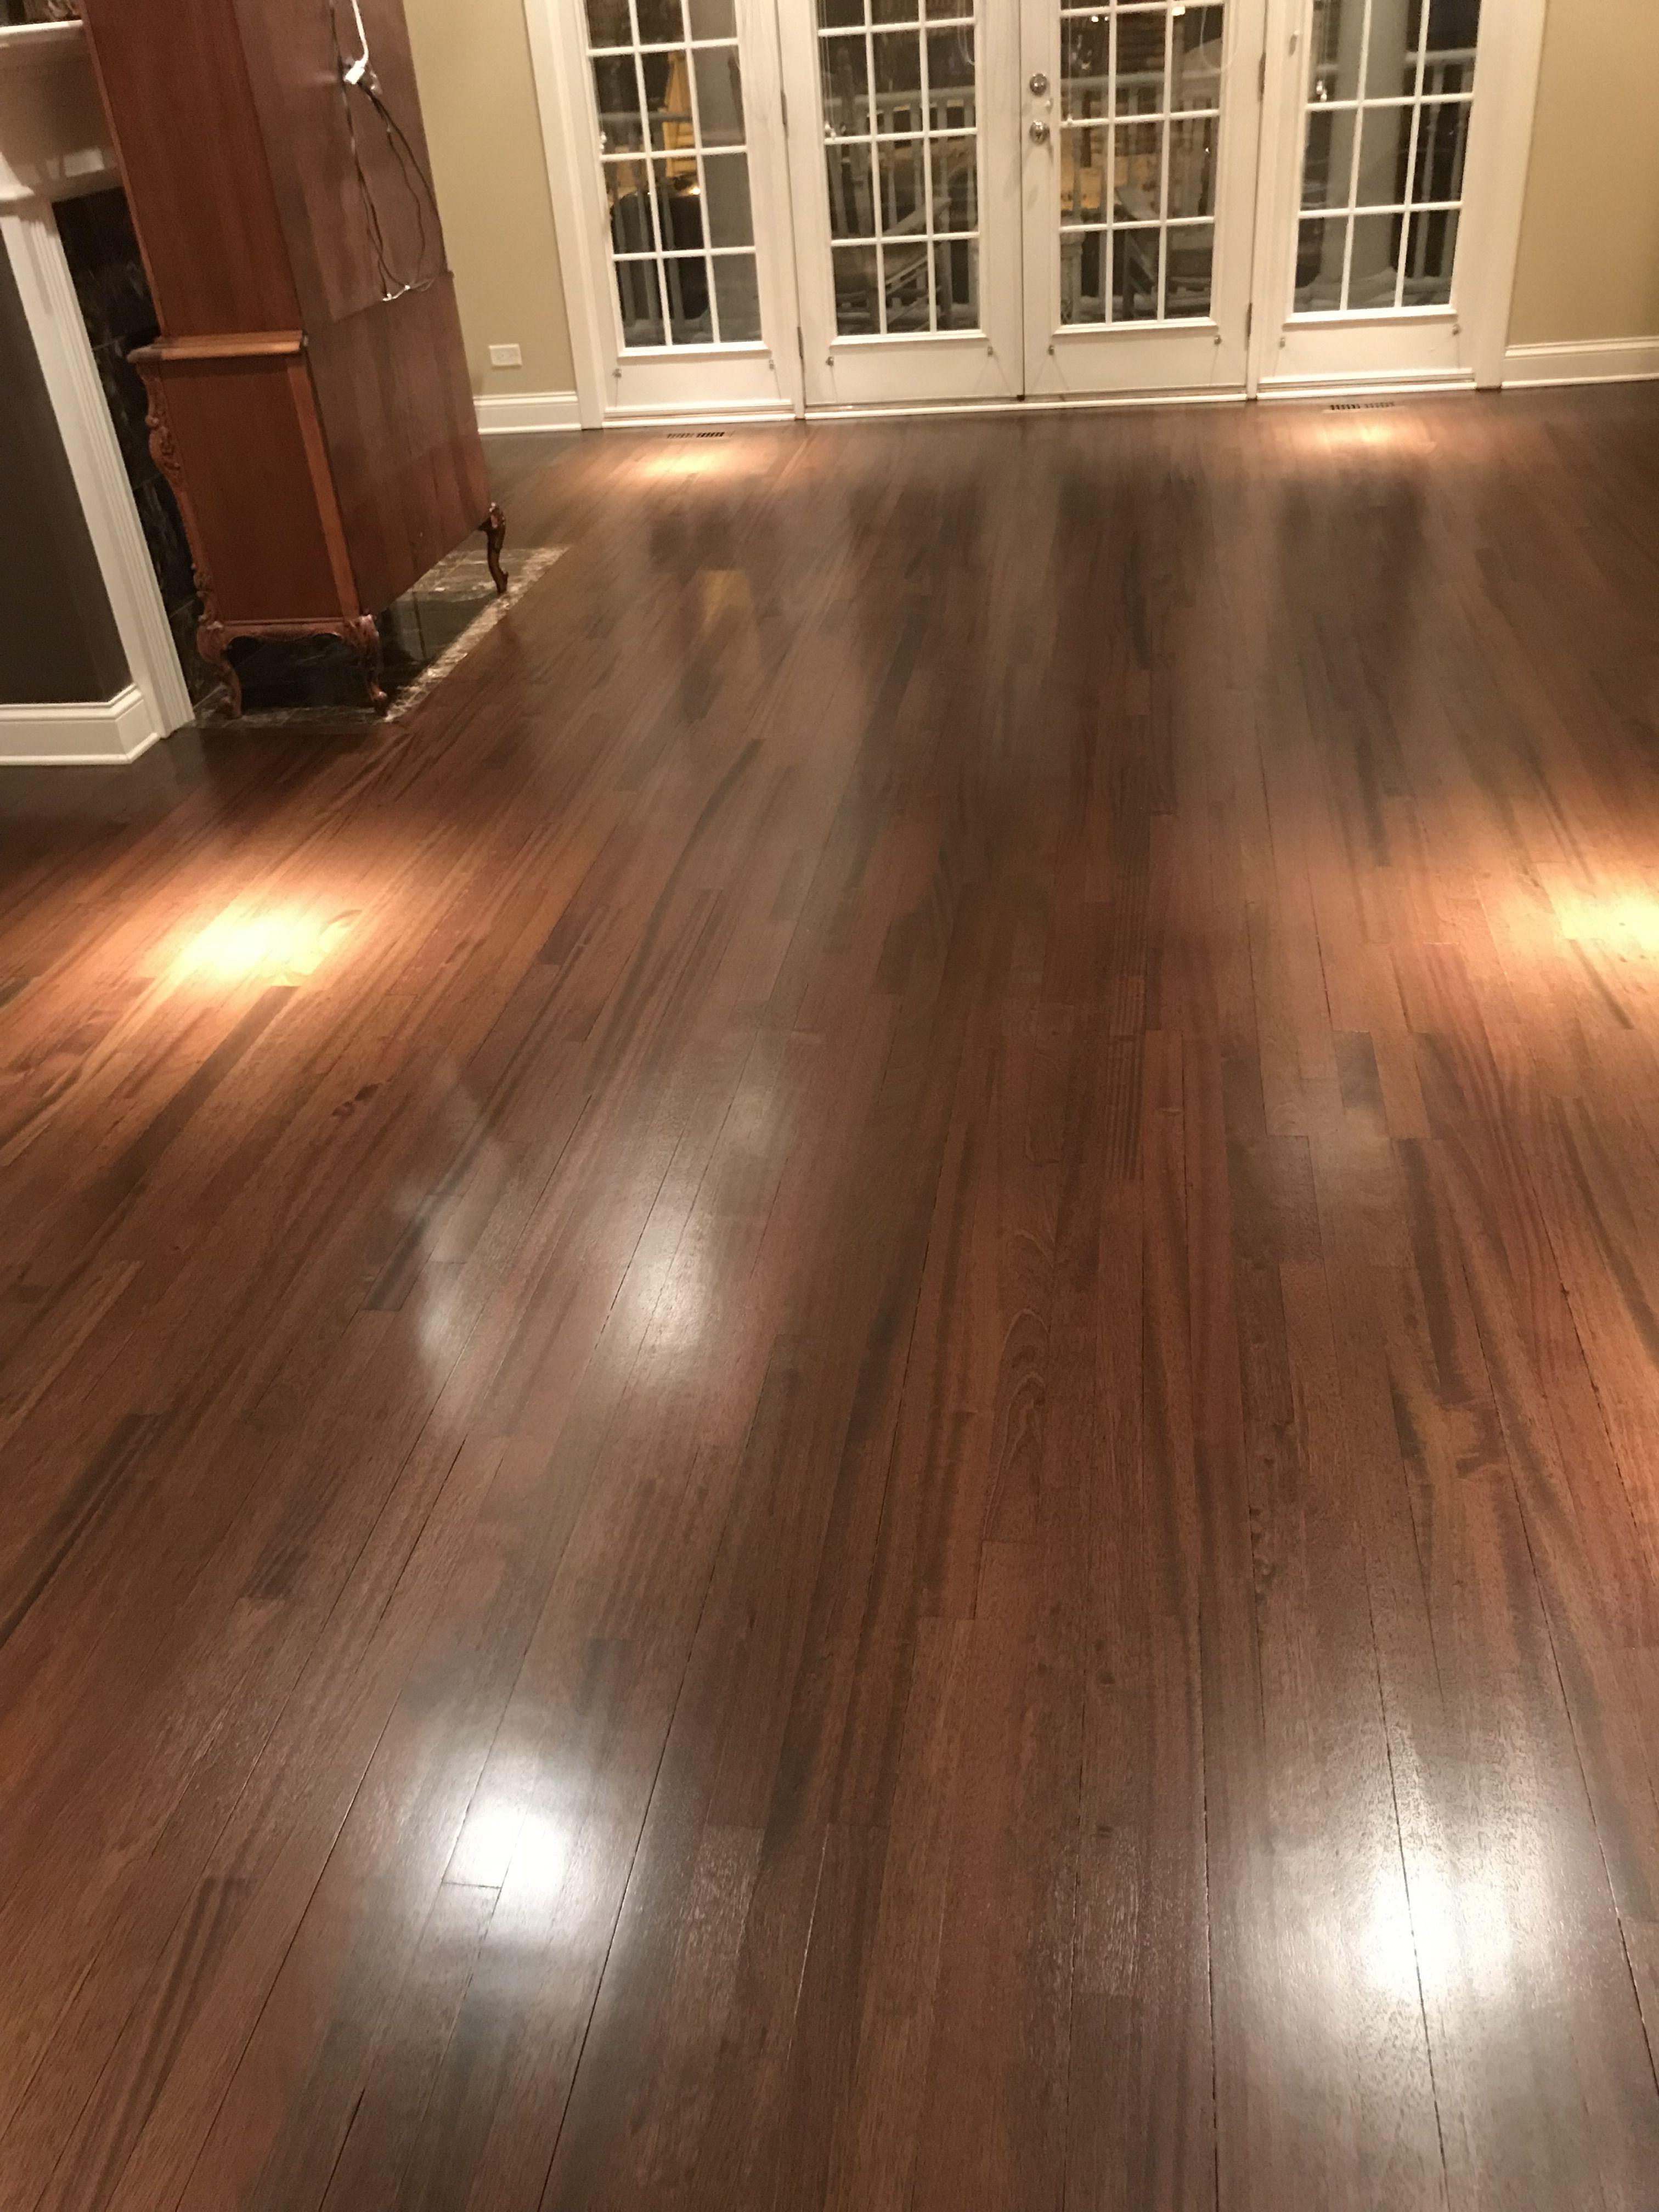 Brazilian Cherry Hardwood Floor With Dark Walnut Stain In 2020 Brazilian Walnut Floors Cherry Hardwood Flooring Brazilian Cherry Hardwood Flooring